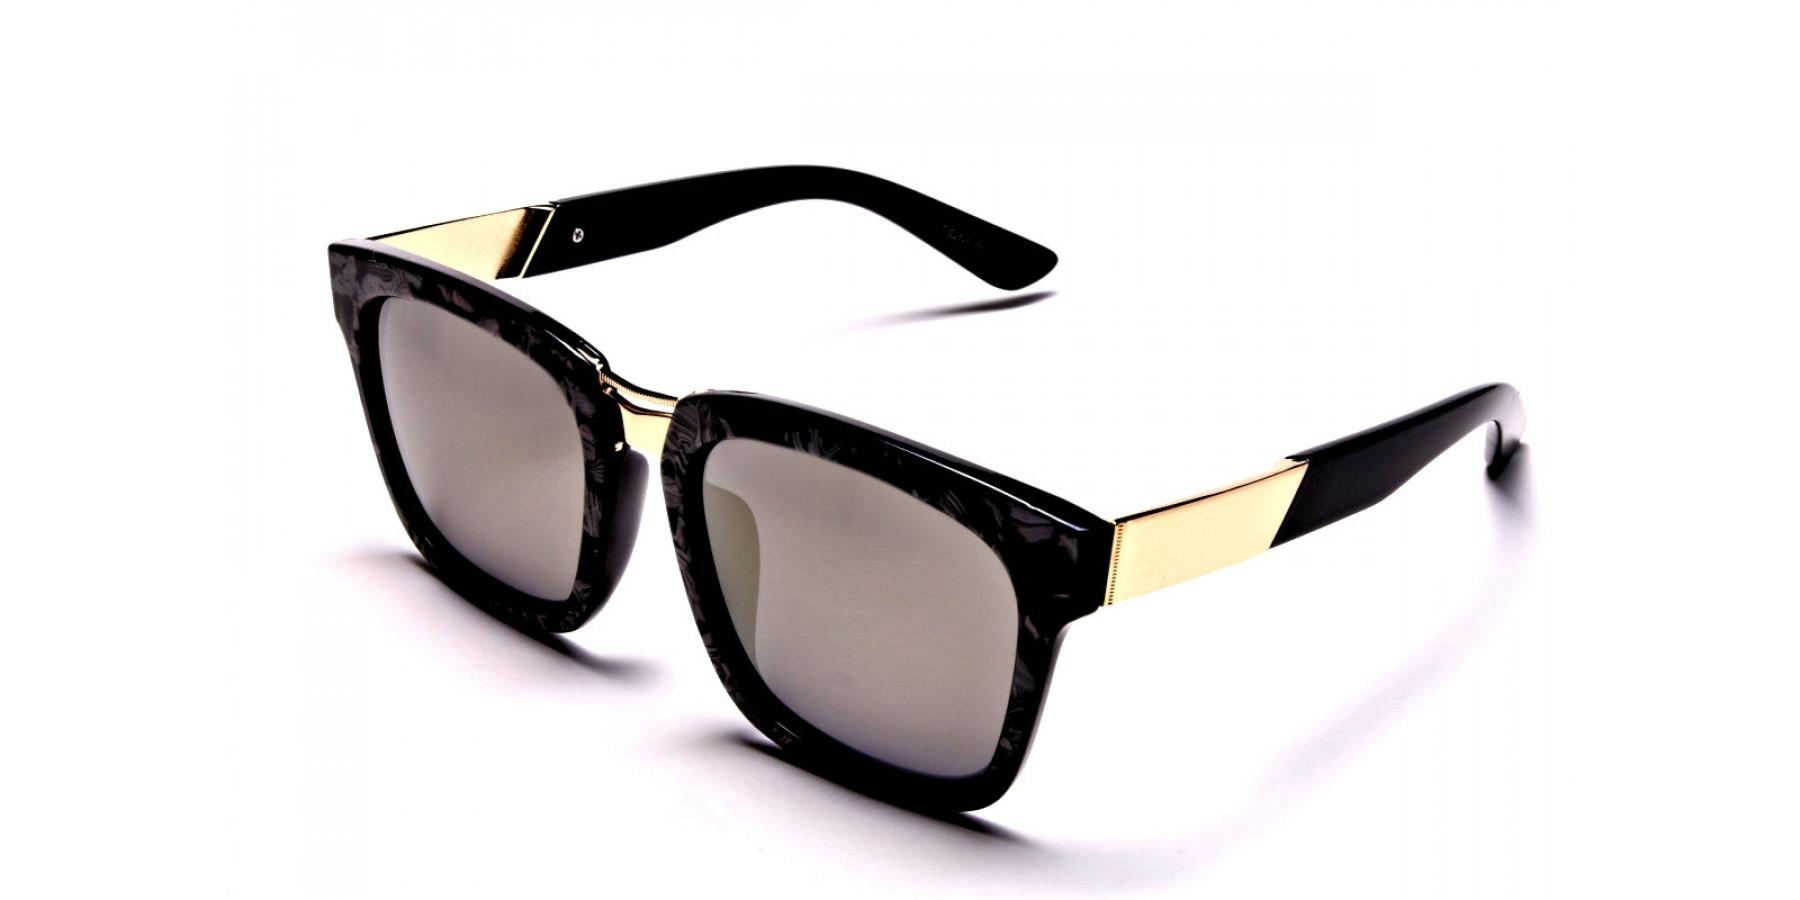 Black & Gold Sunglasses -2